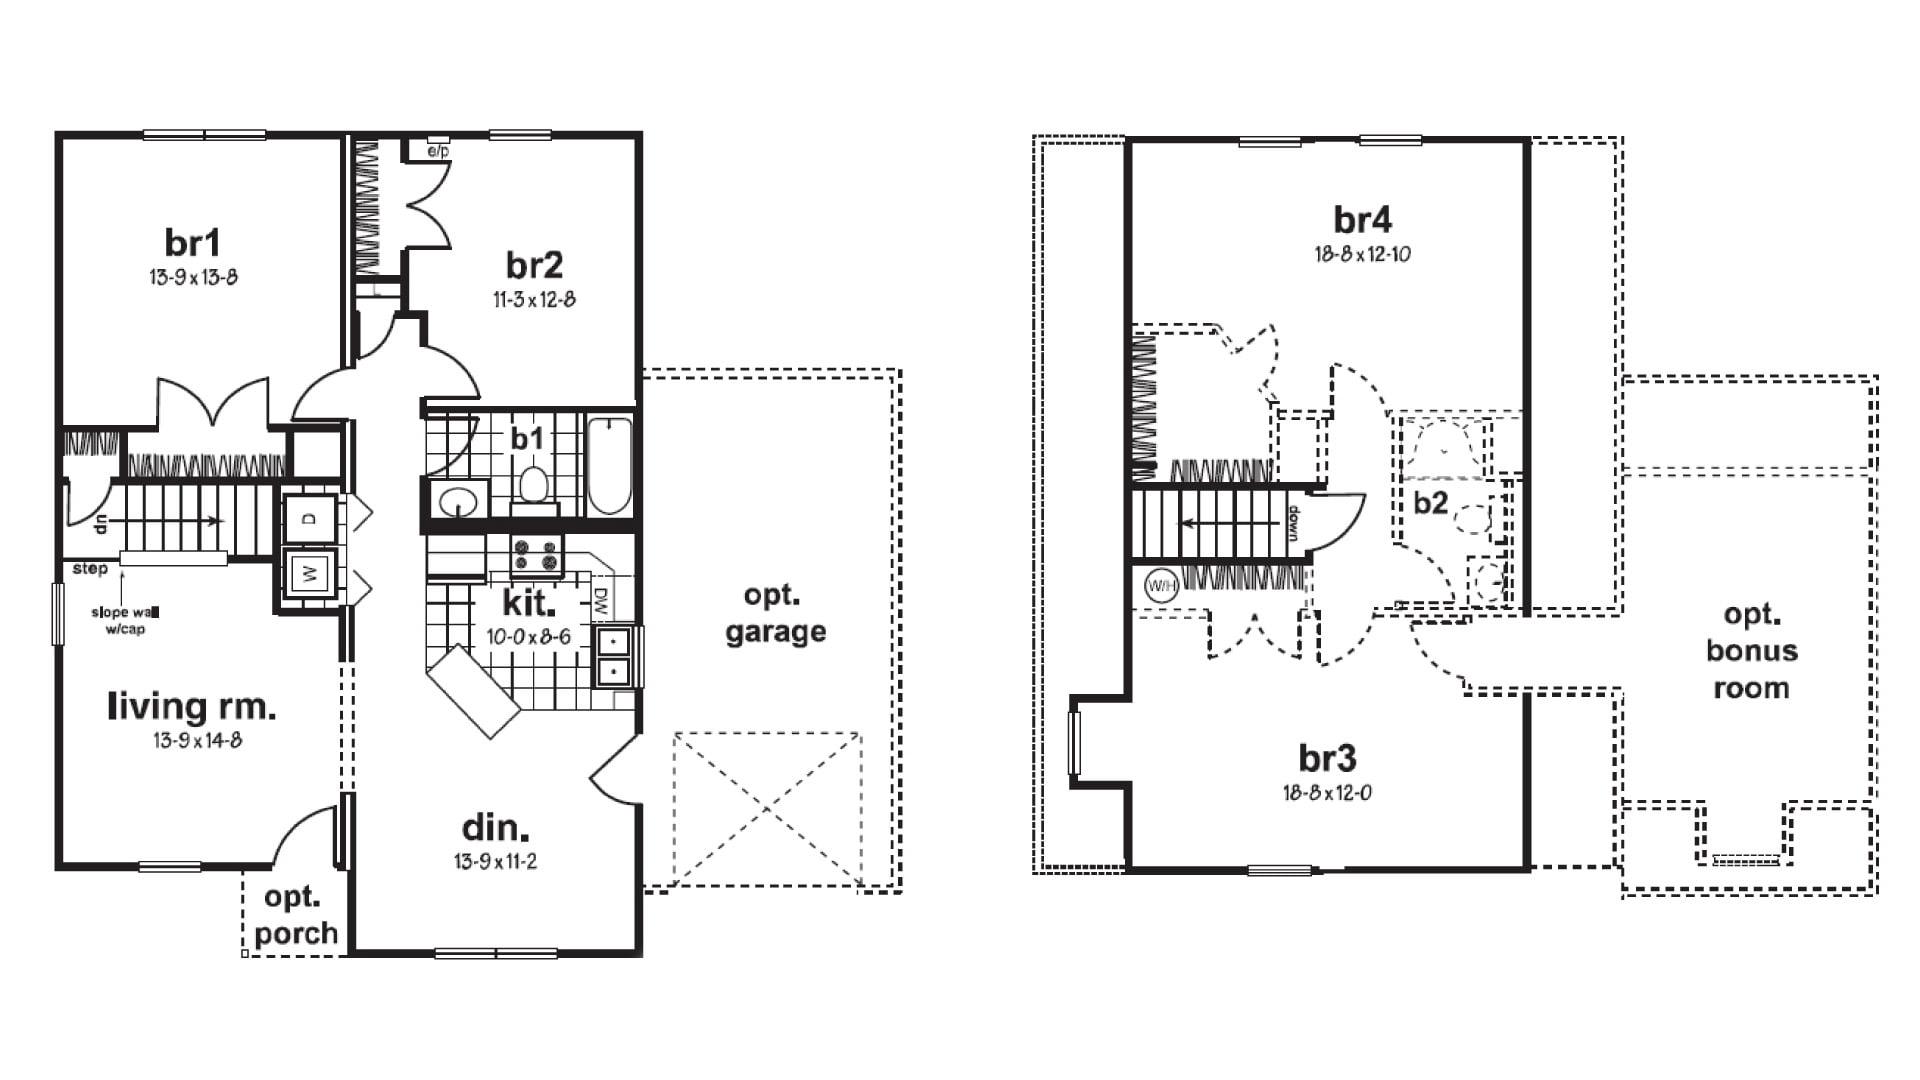 York Cape Cod Modular Home Floor Plan